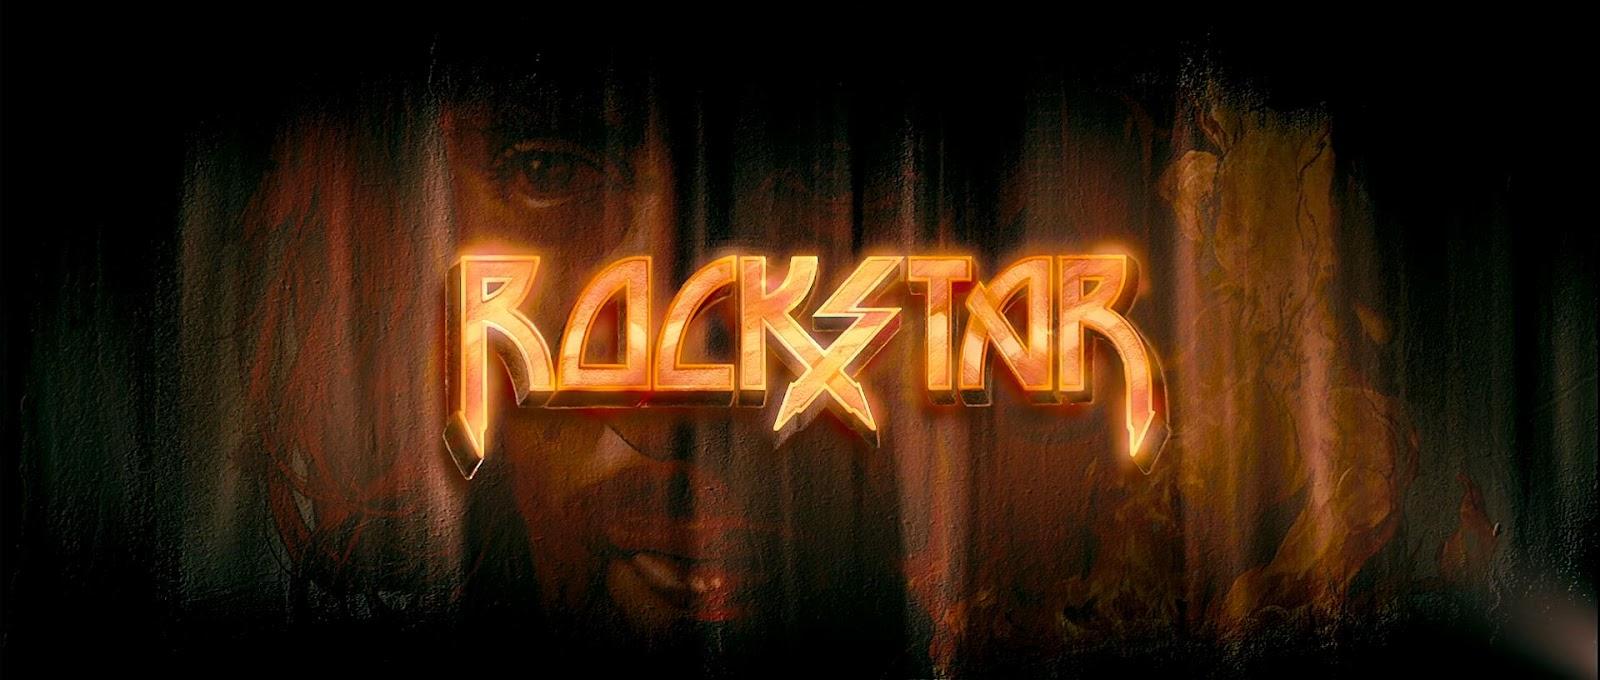 Rockstar (2011) Hindi Full Movie *Bluray*